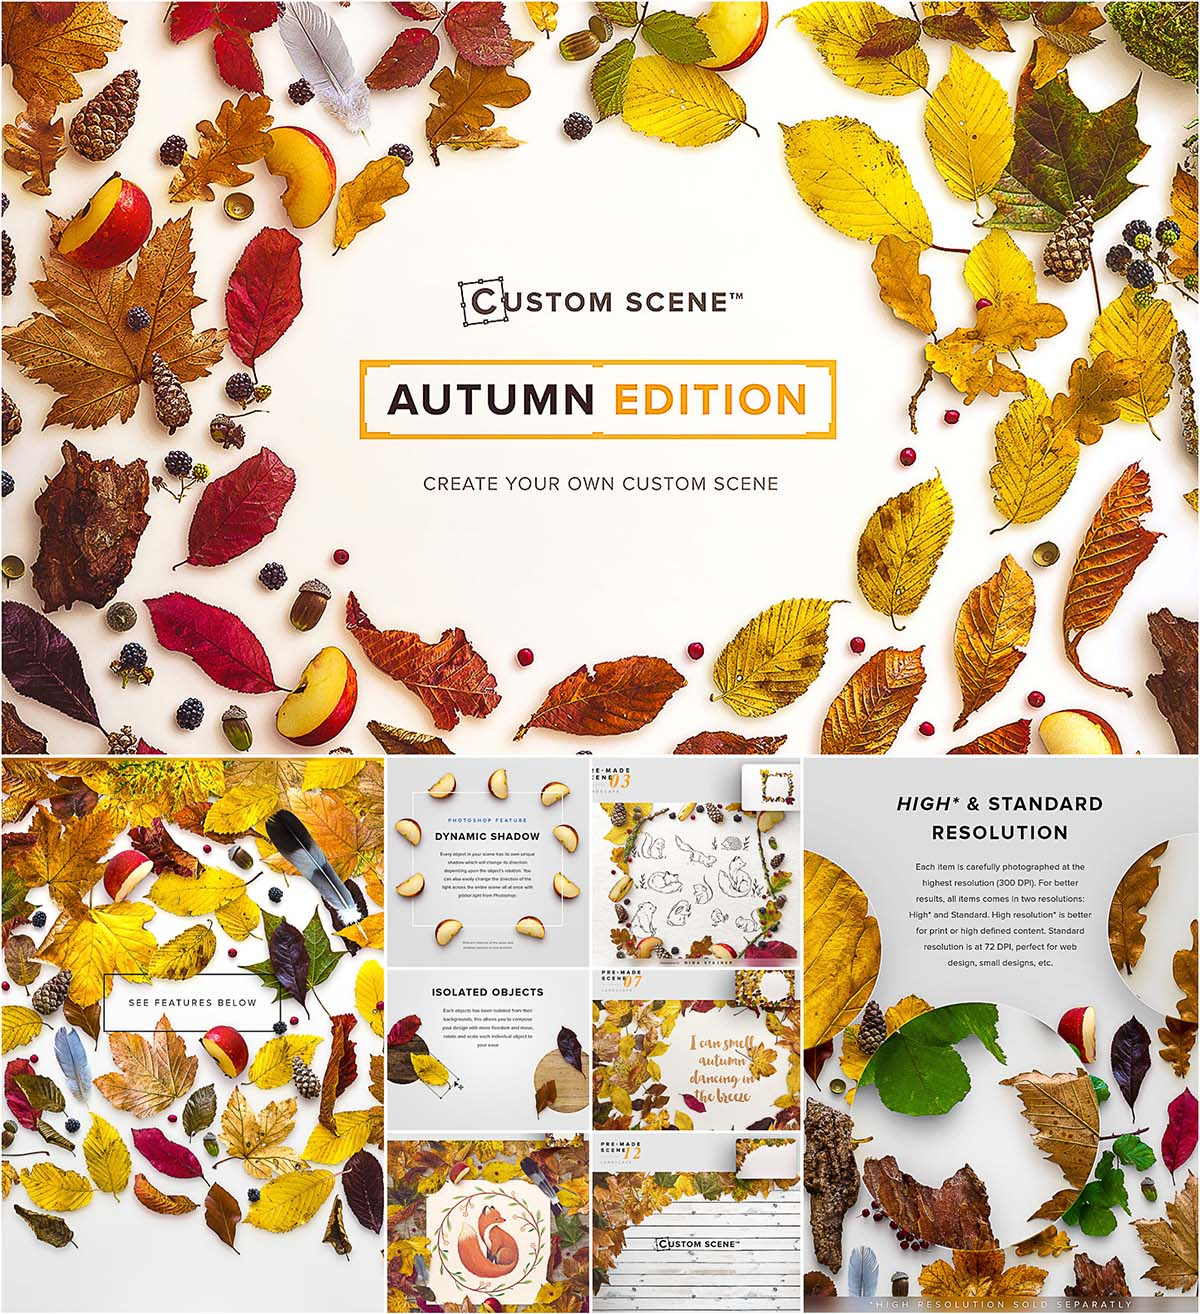 Custom scene Autumn edition mockup